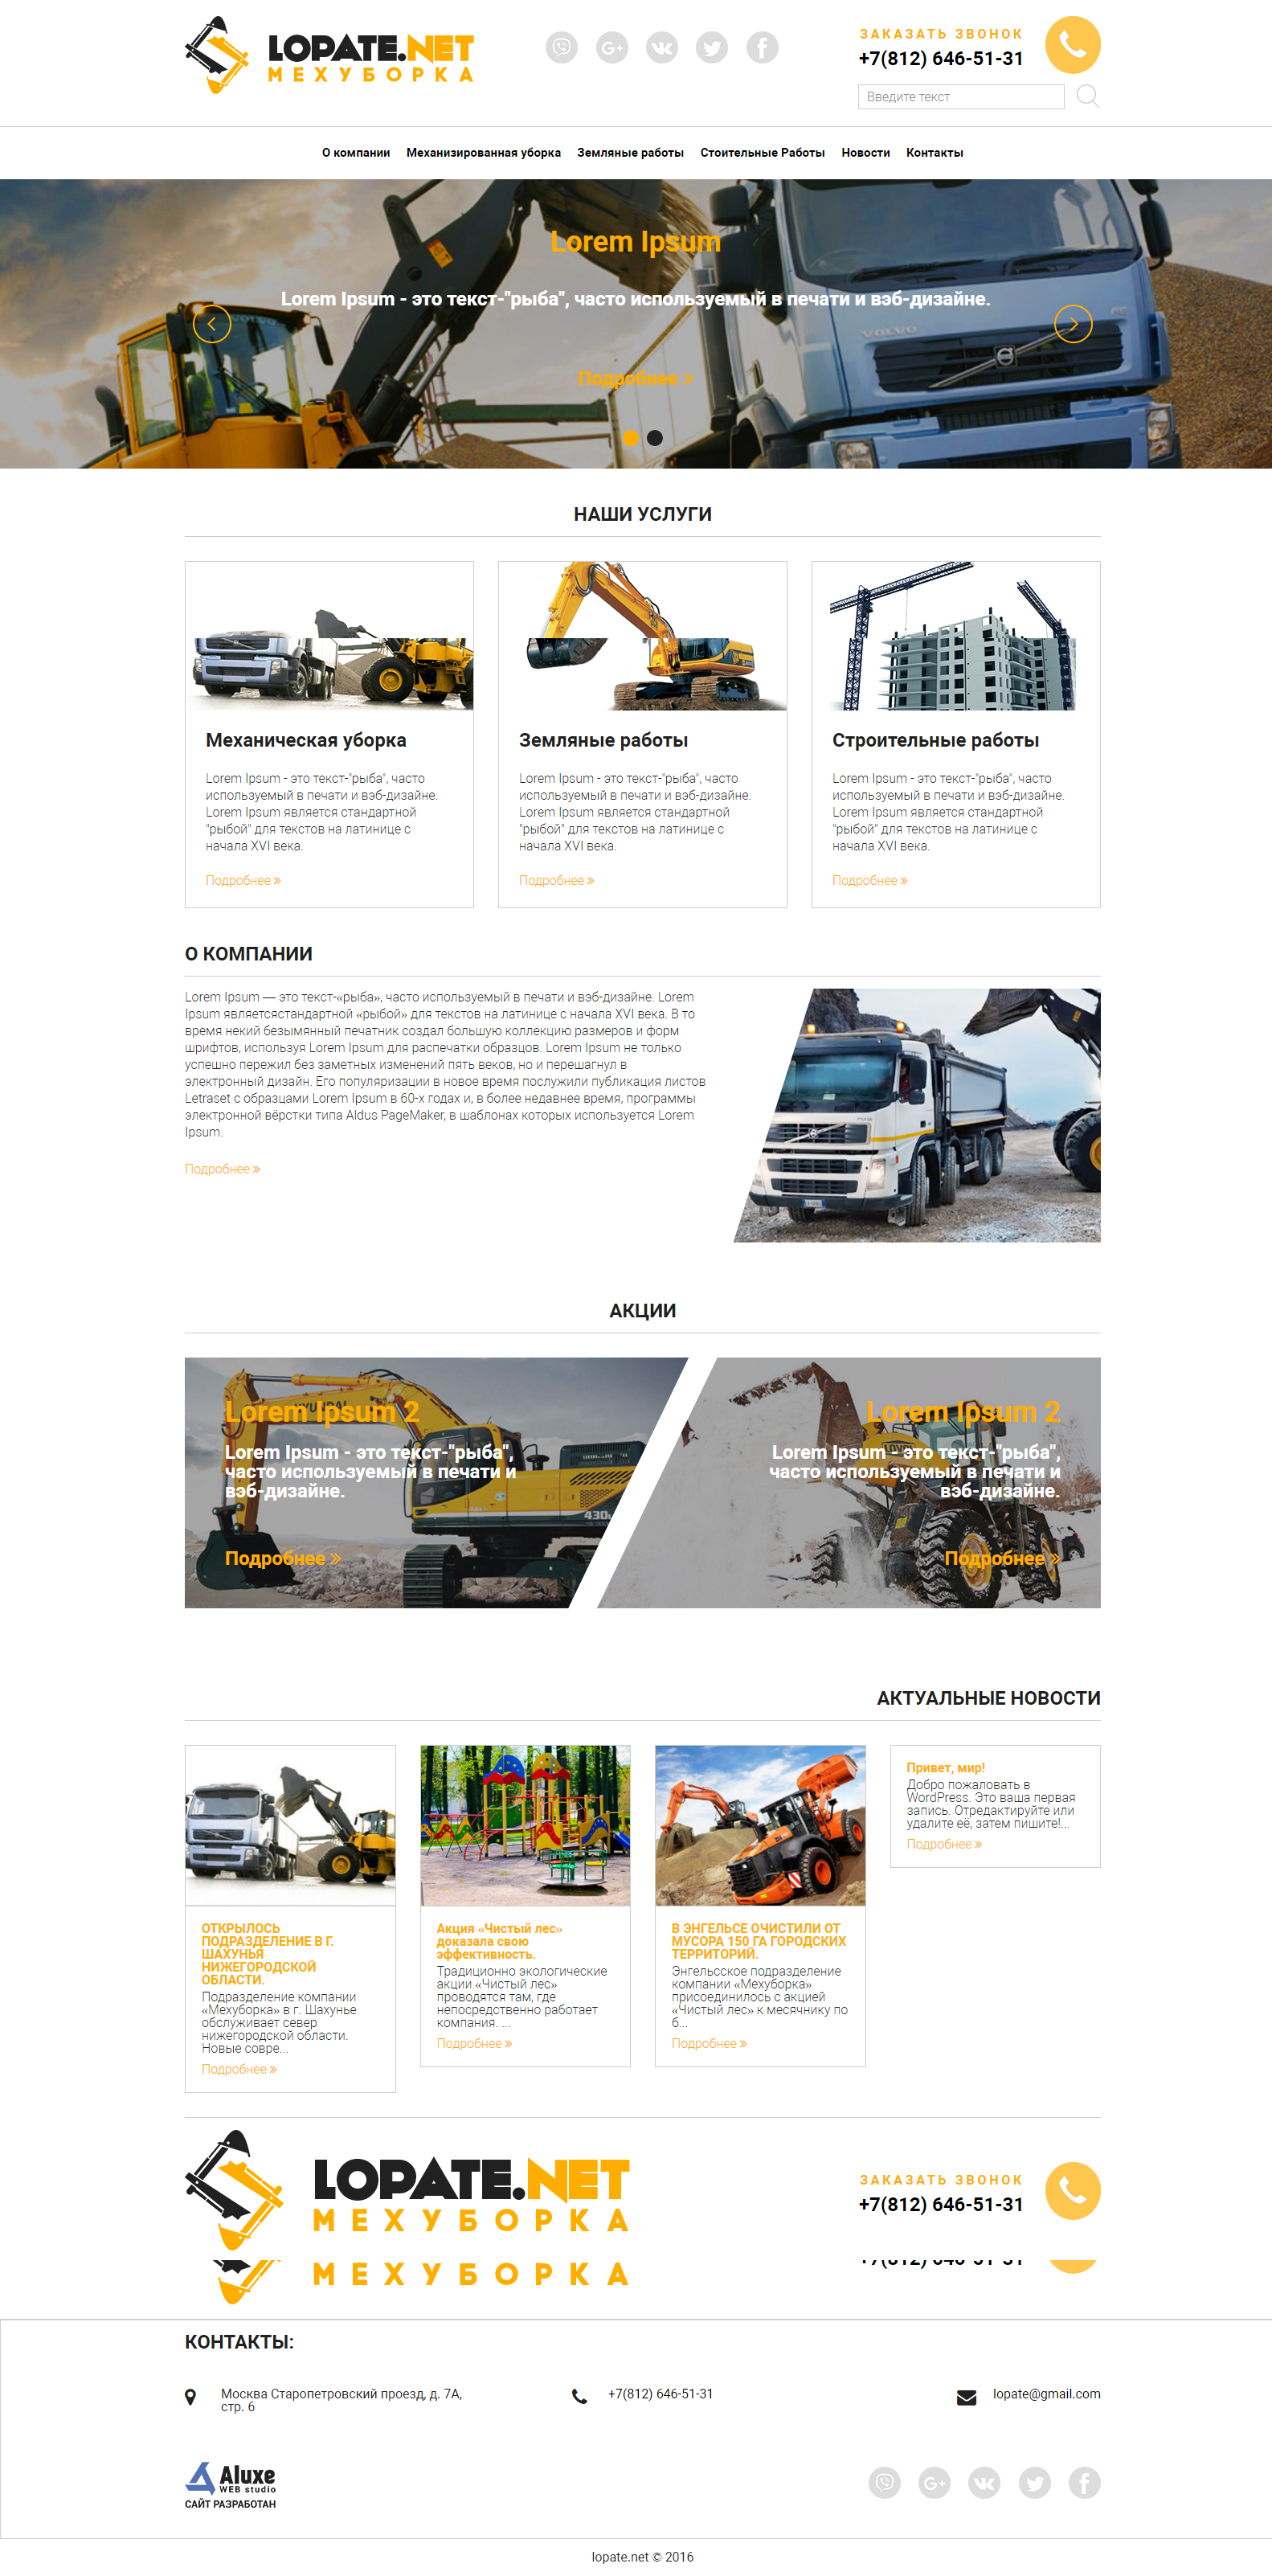 Создание сайта Lopate